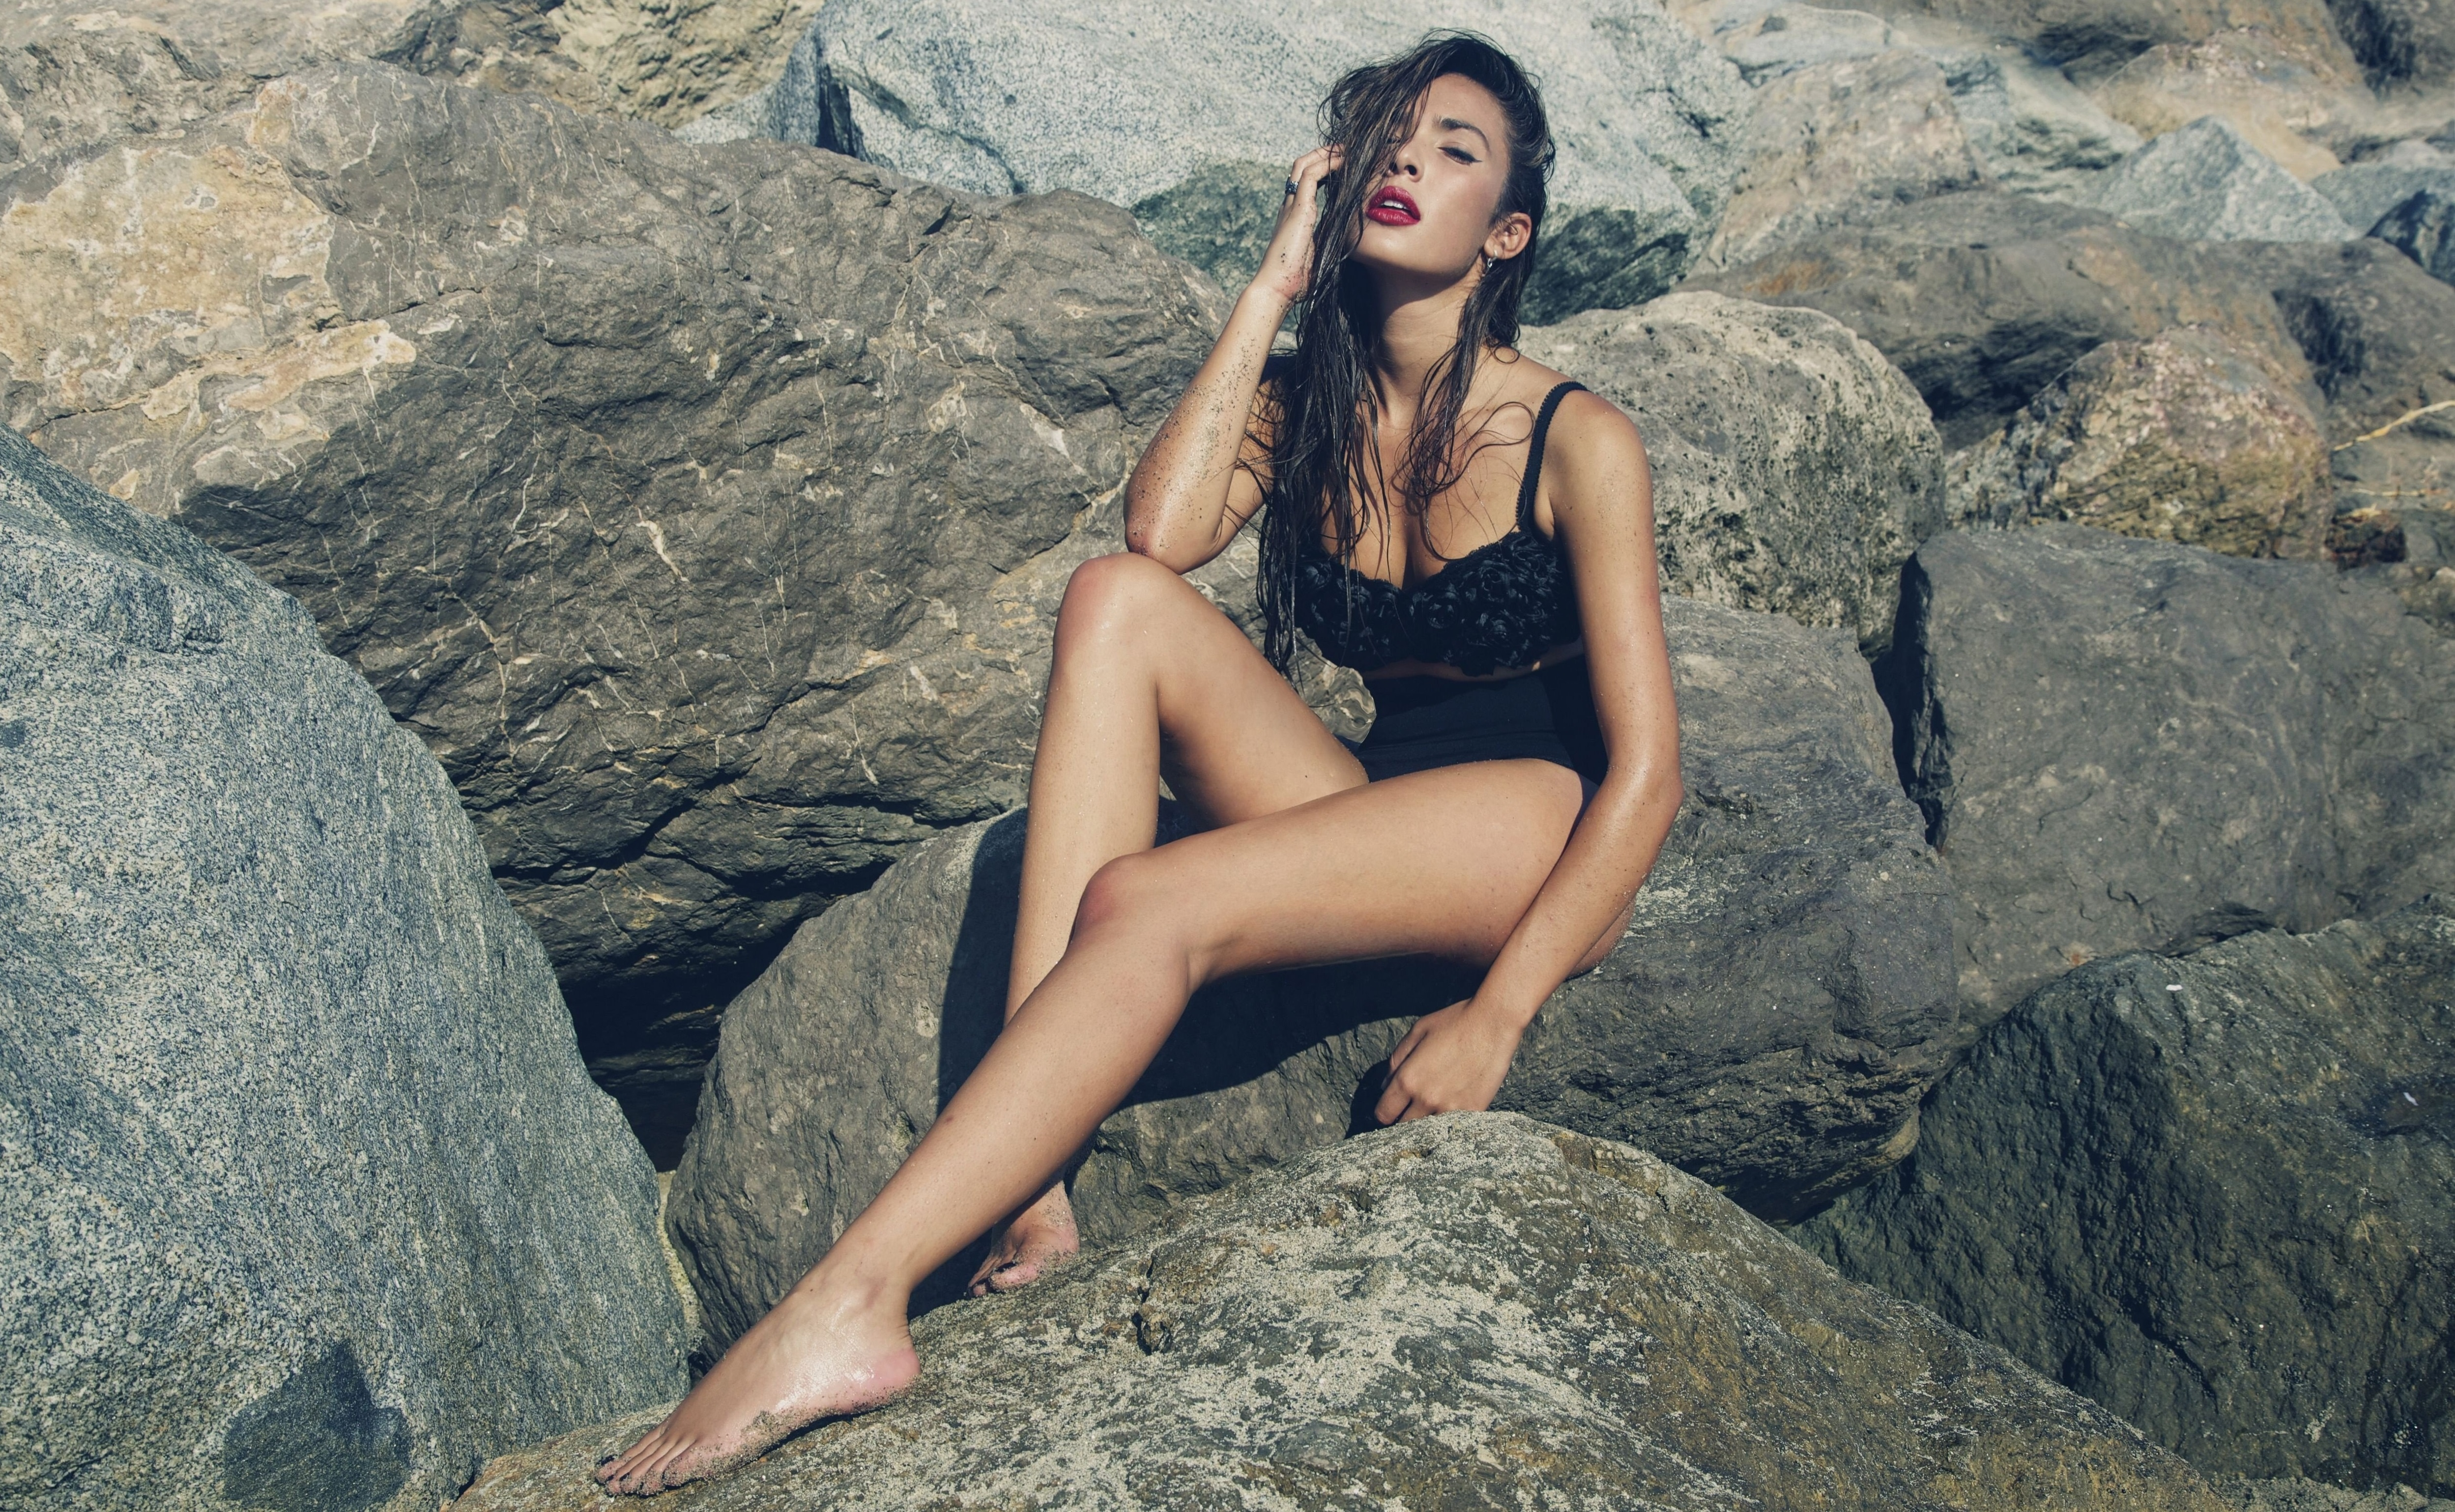 Porno Ana Moya Calzado naked (82 photos), Sexy, Hot, Twitter, underwear 2015